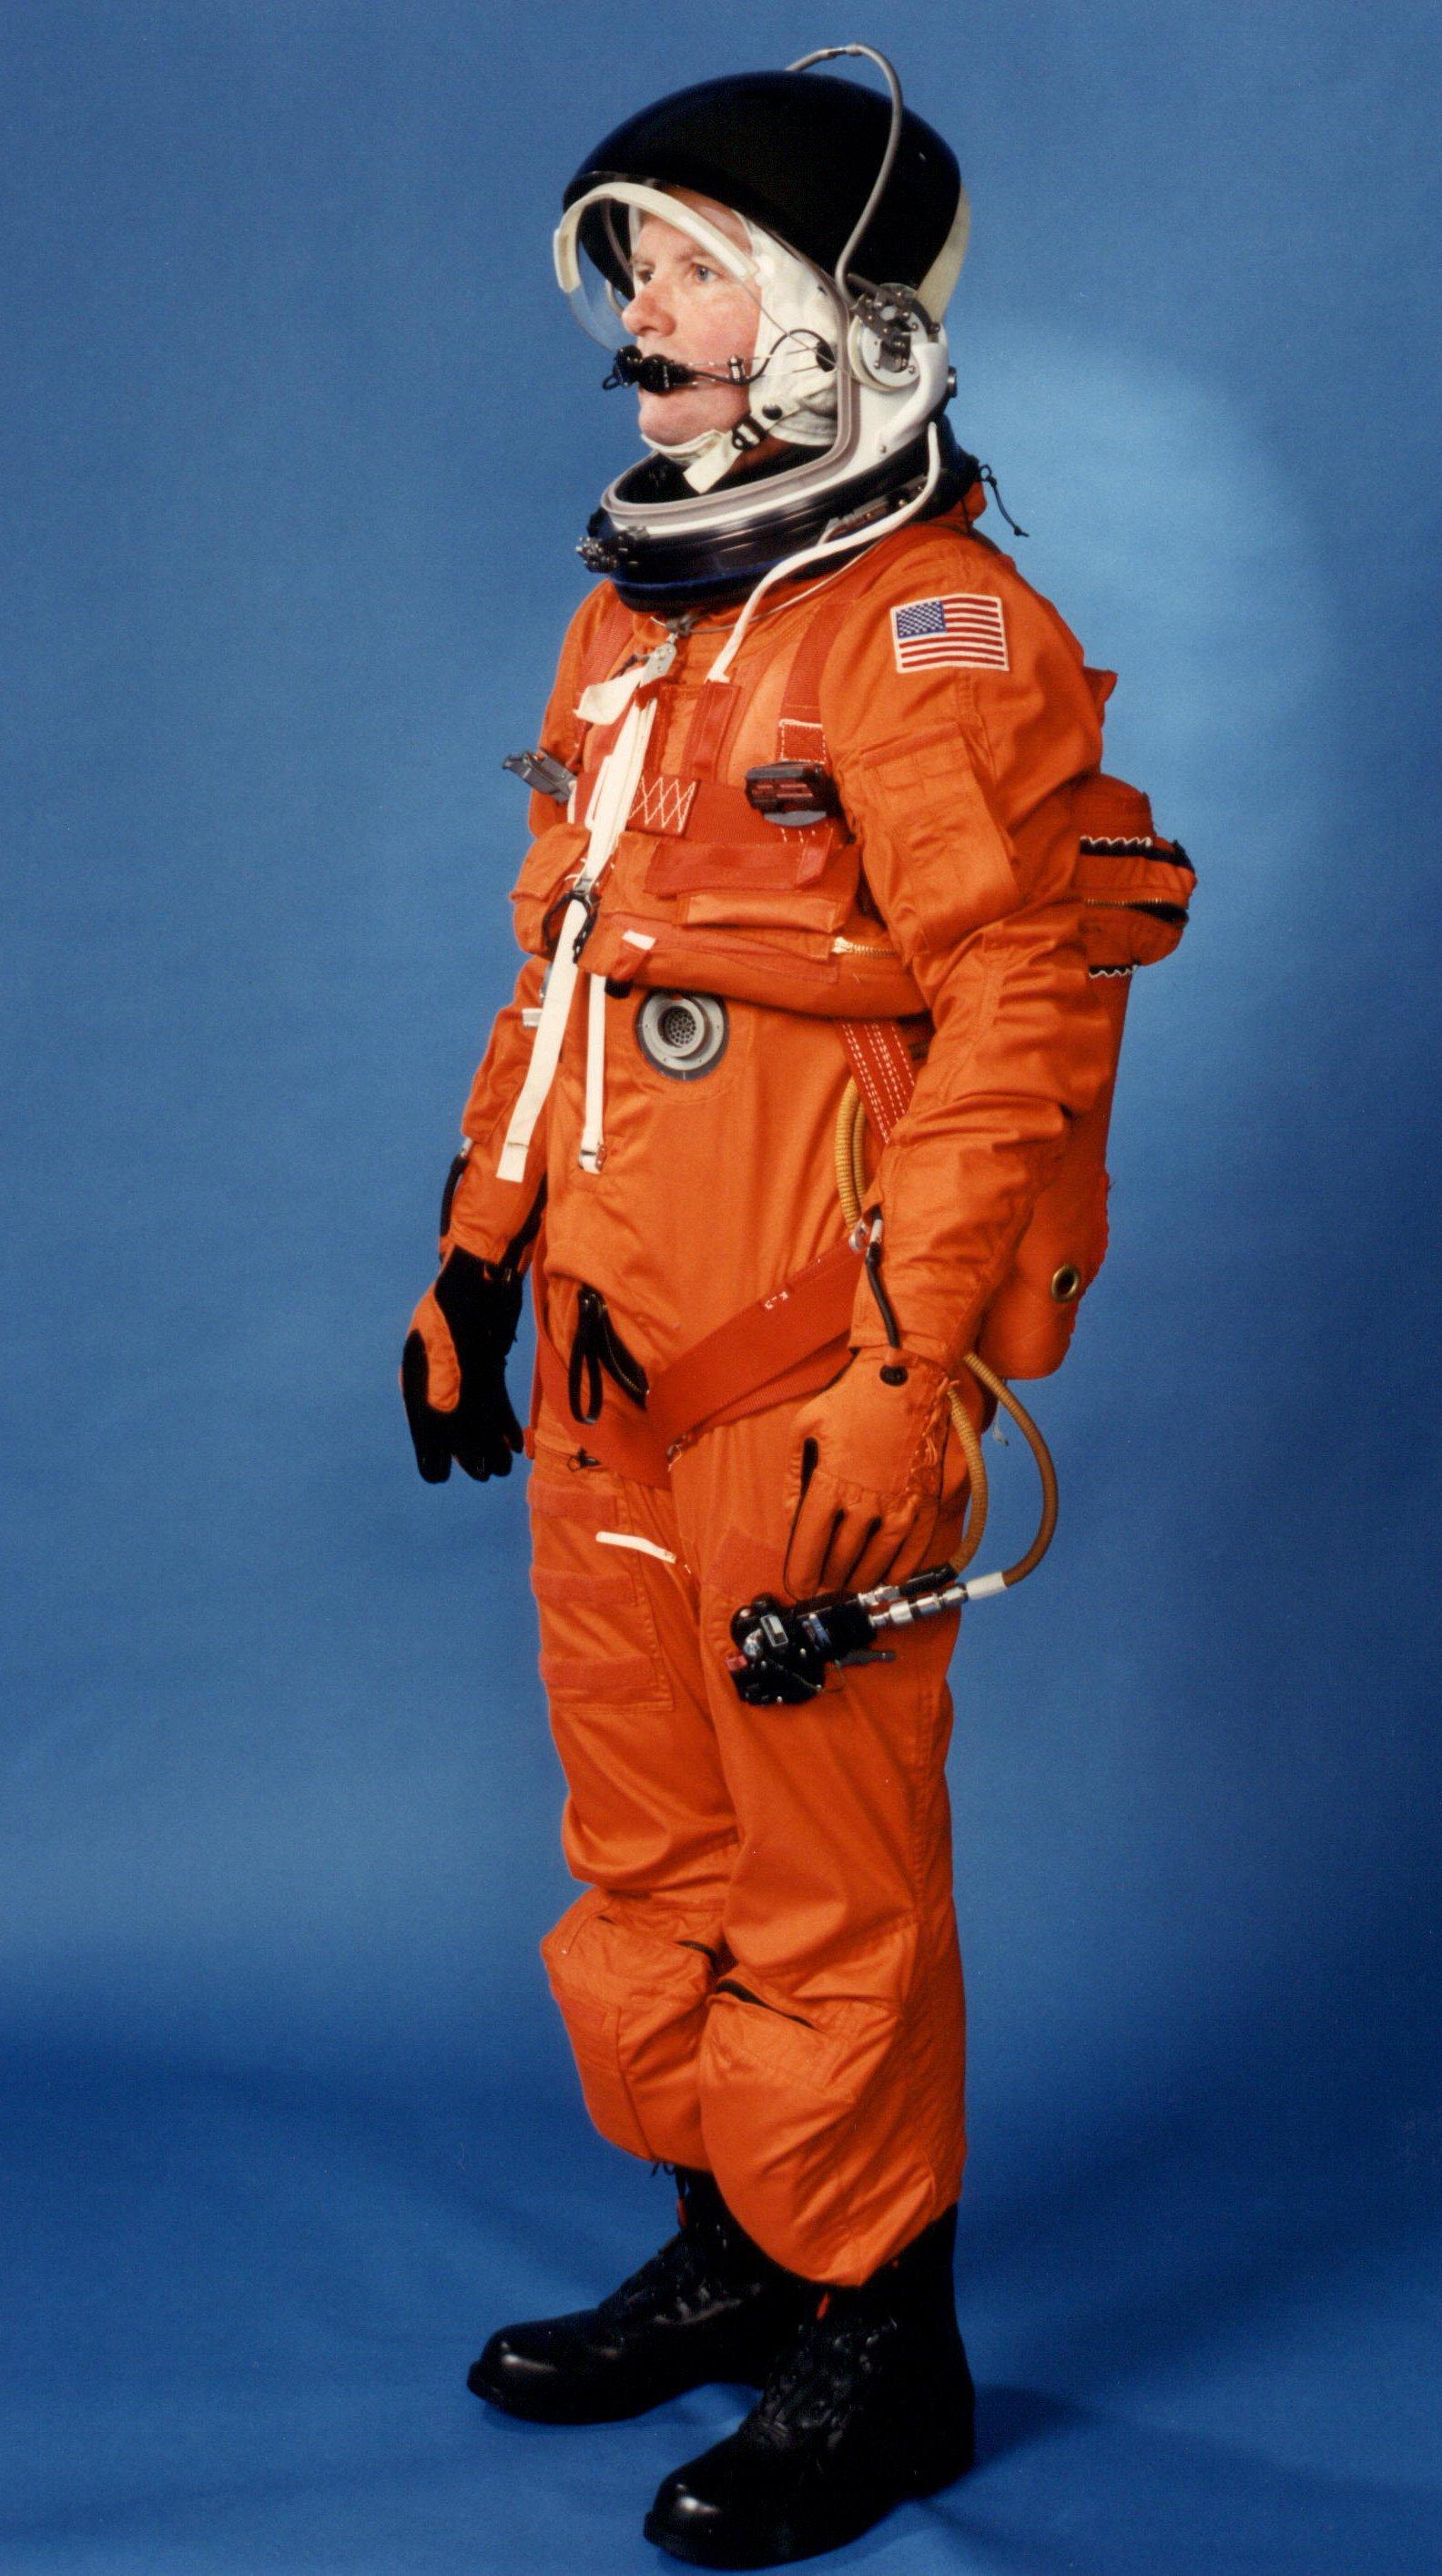 сонник скафандр космонавта